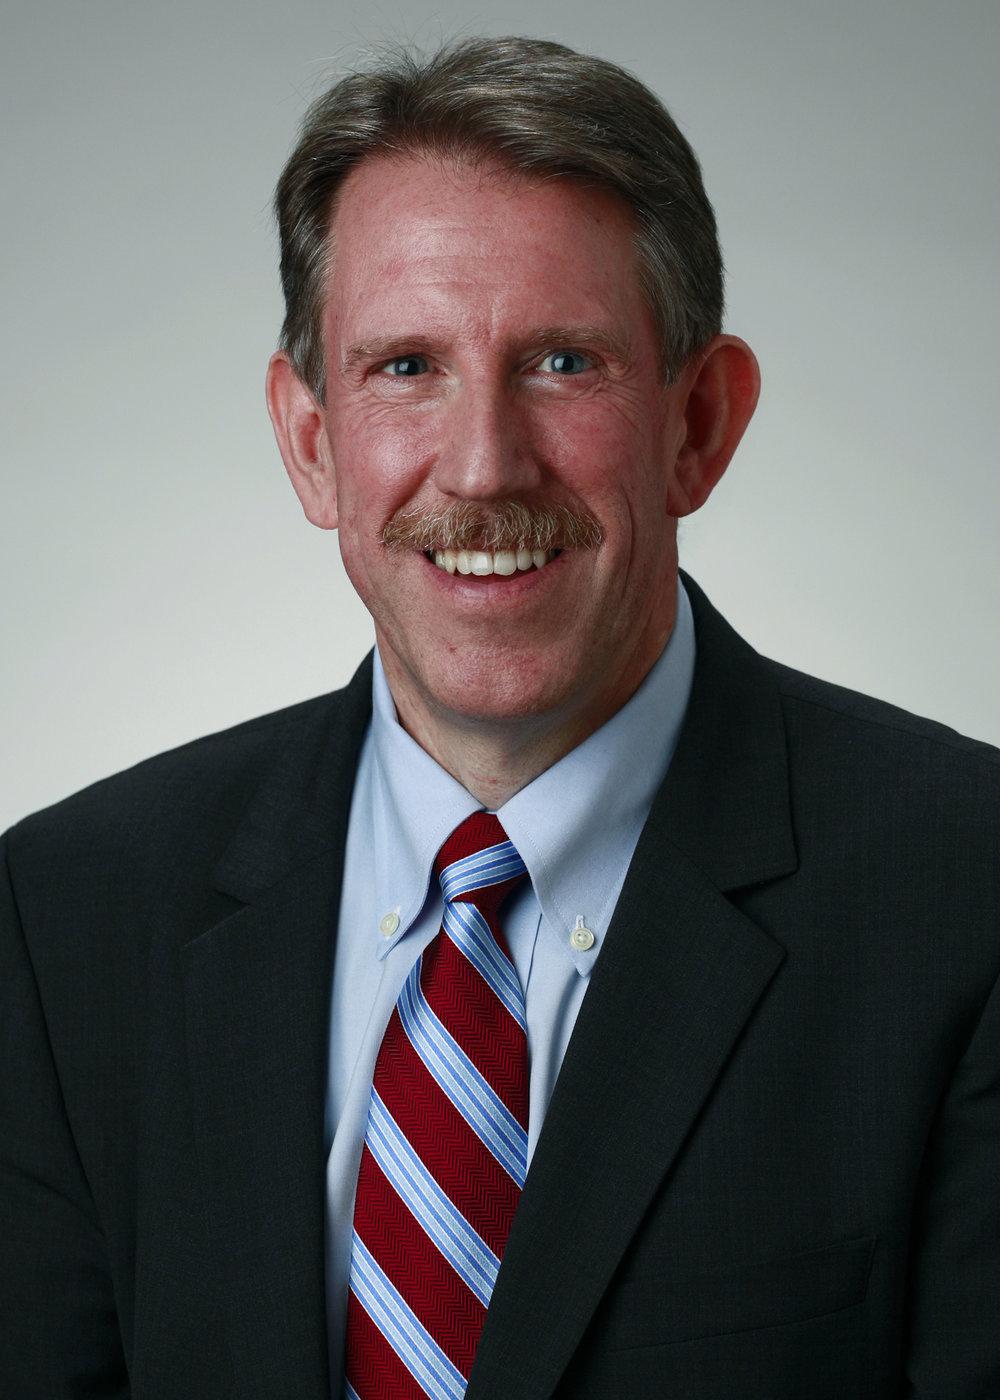 <b>Dave Roberts</b><br>Professor of Marketing, UNC Kenan-Flagler Business School